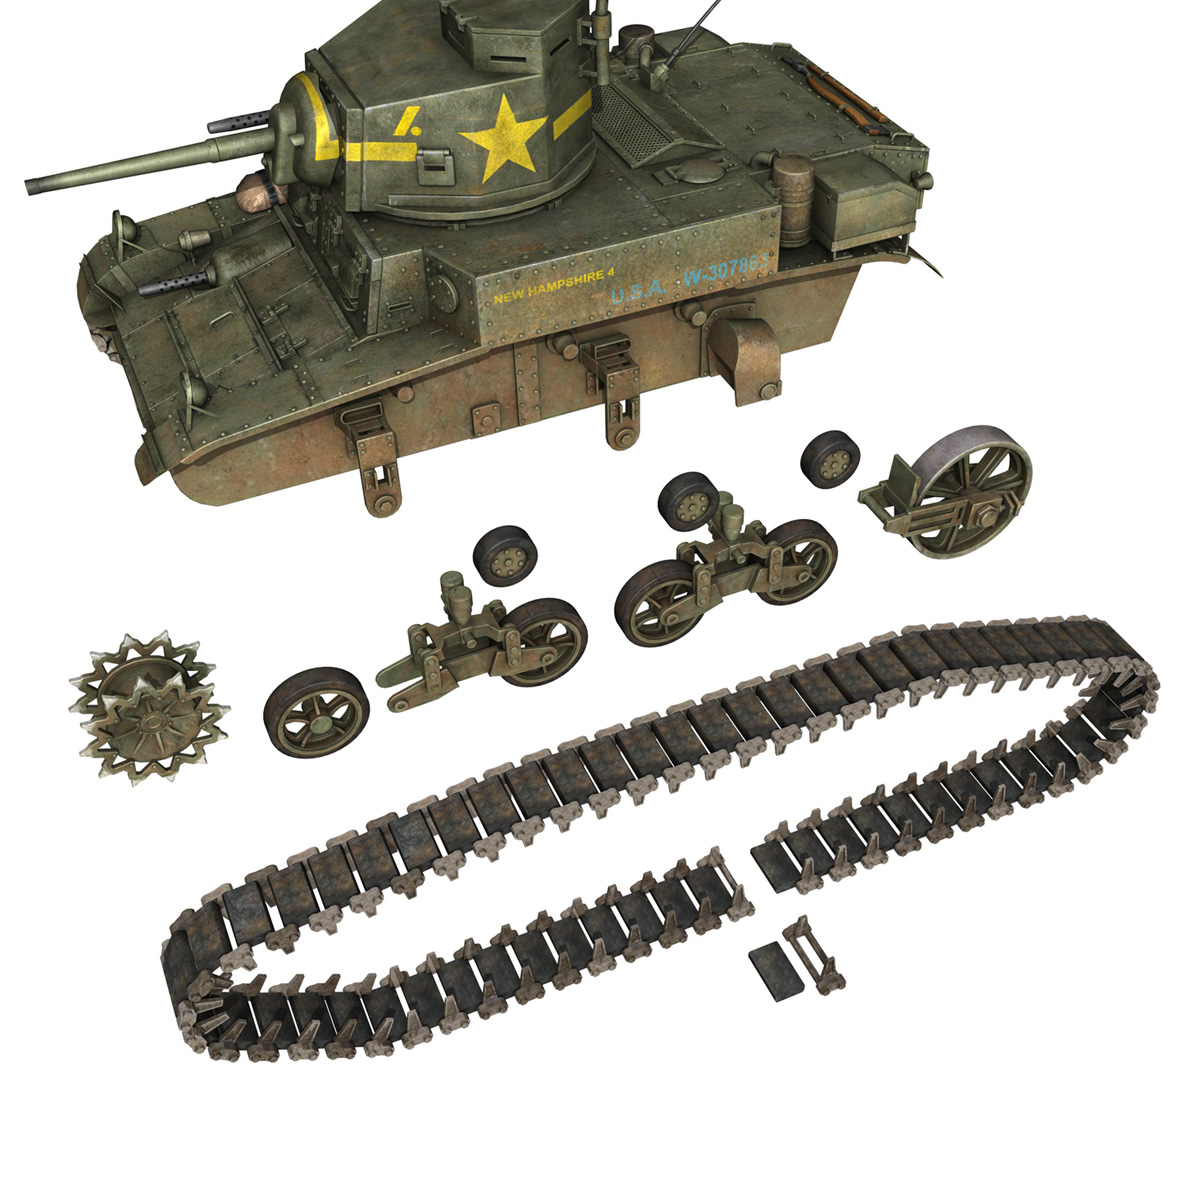 m3 light tank stuart – new hampshire 4 3d model 3ds c4d fbx lwo lw lws obj 266381